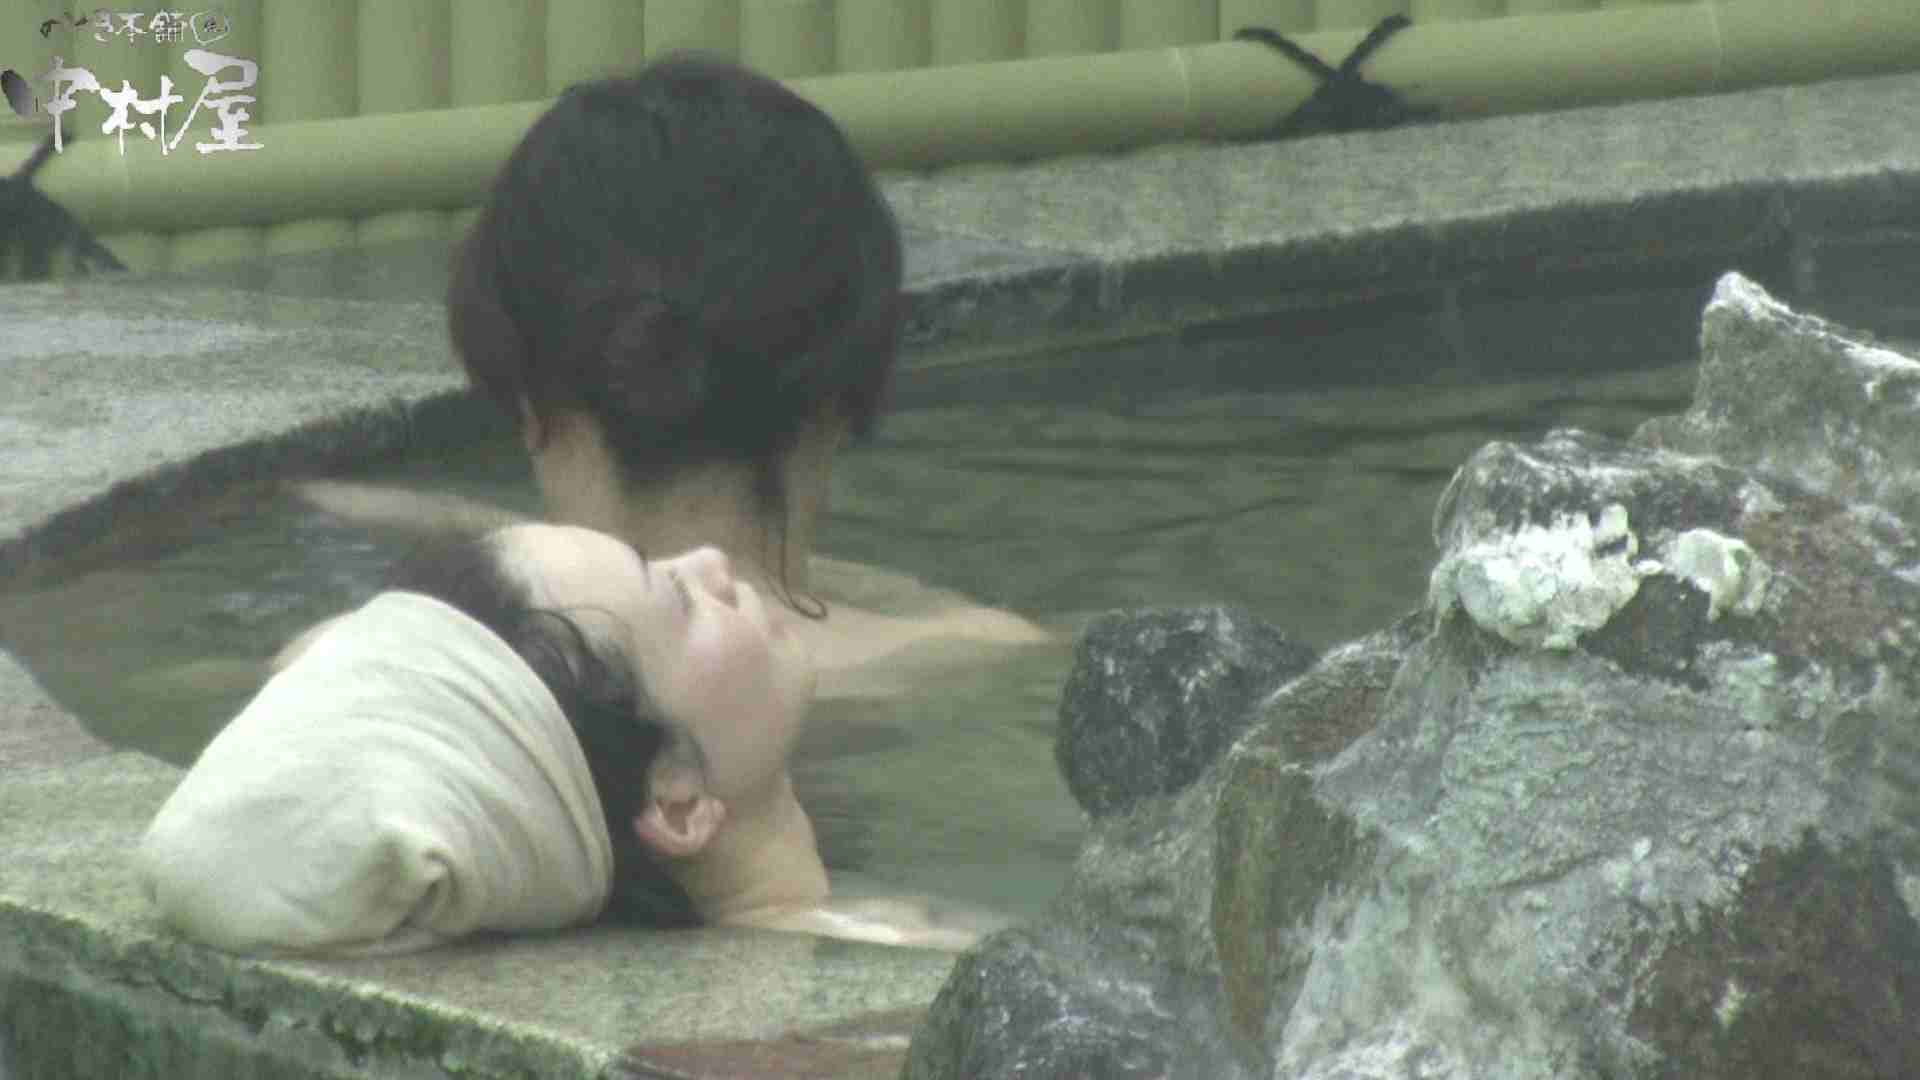 Aquaな露天風呂Vol.906 OLセックス 盗撮オマンコ無修正動画無料 92画像 14